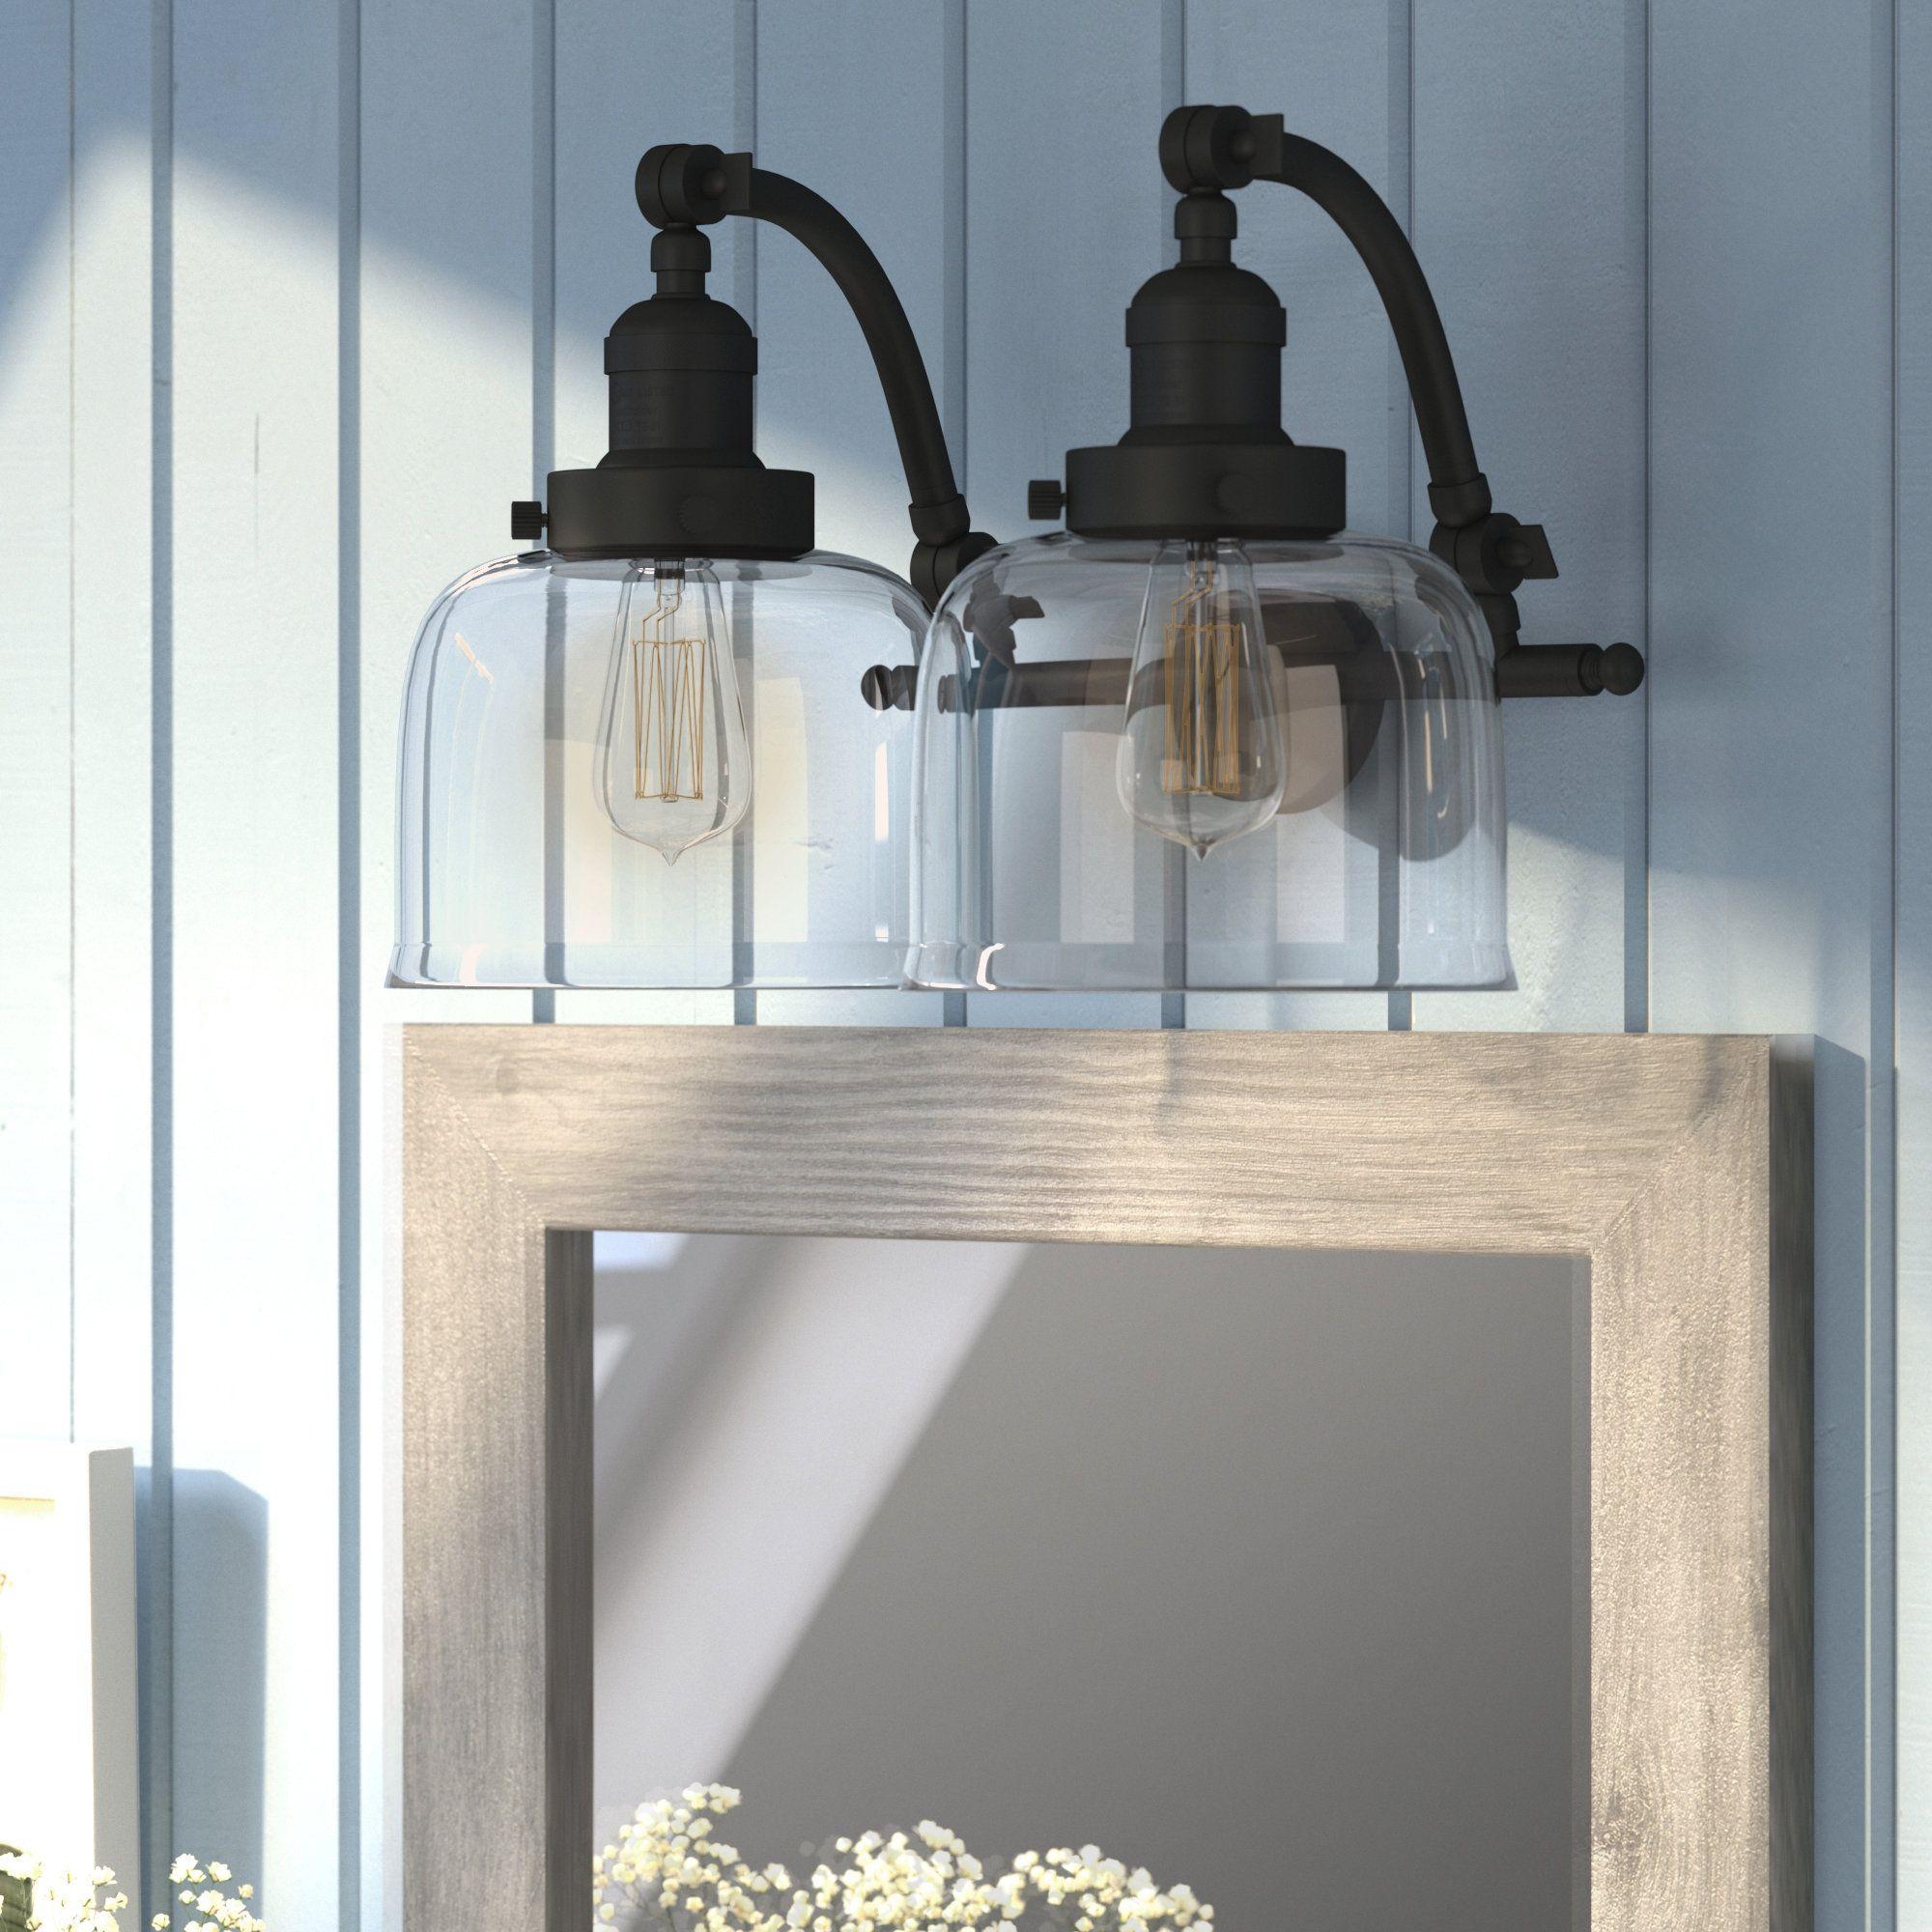 15 Beautiful Bathroom Light Vanity Fixture Design Ideas